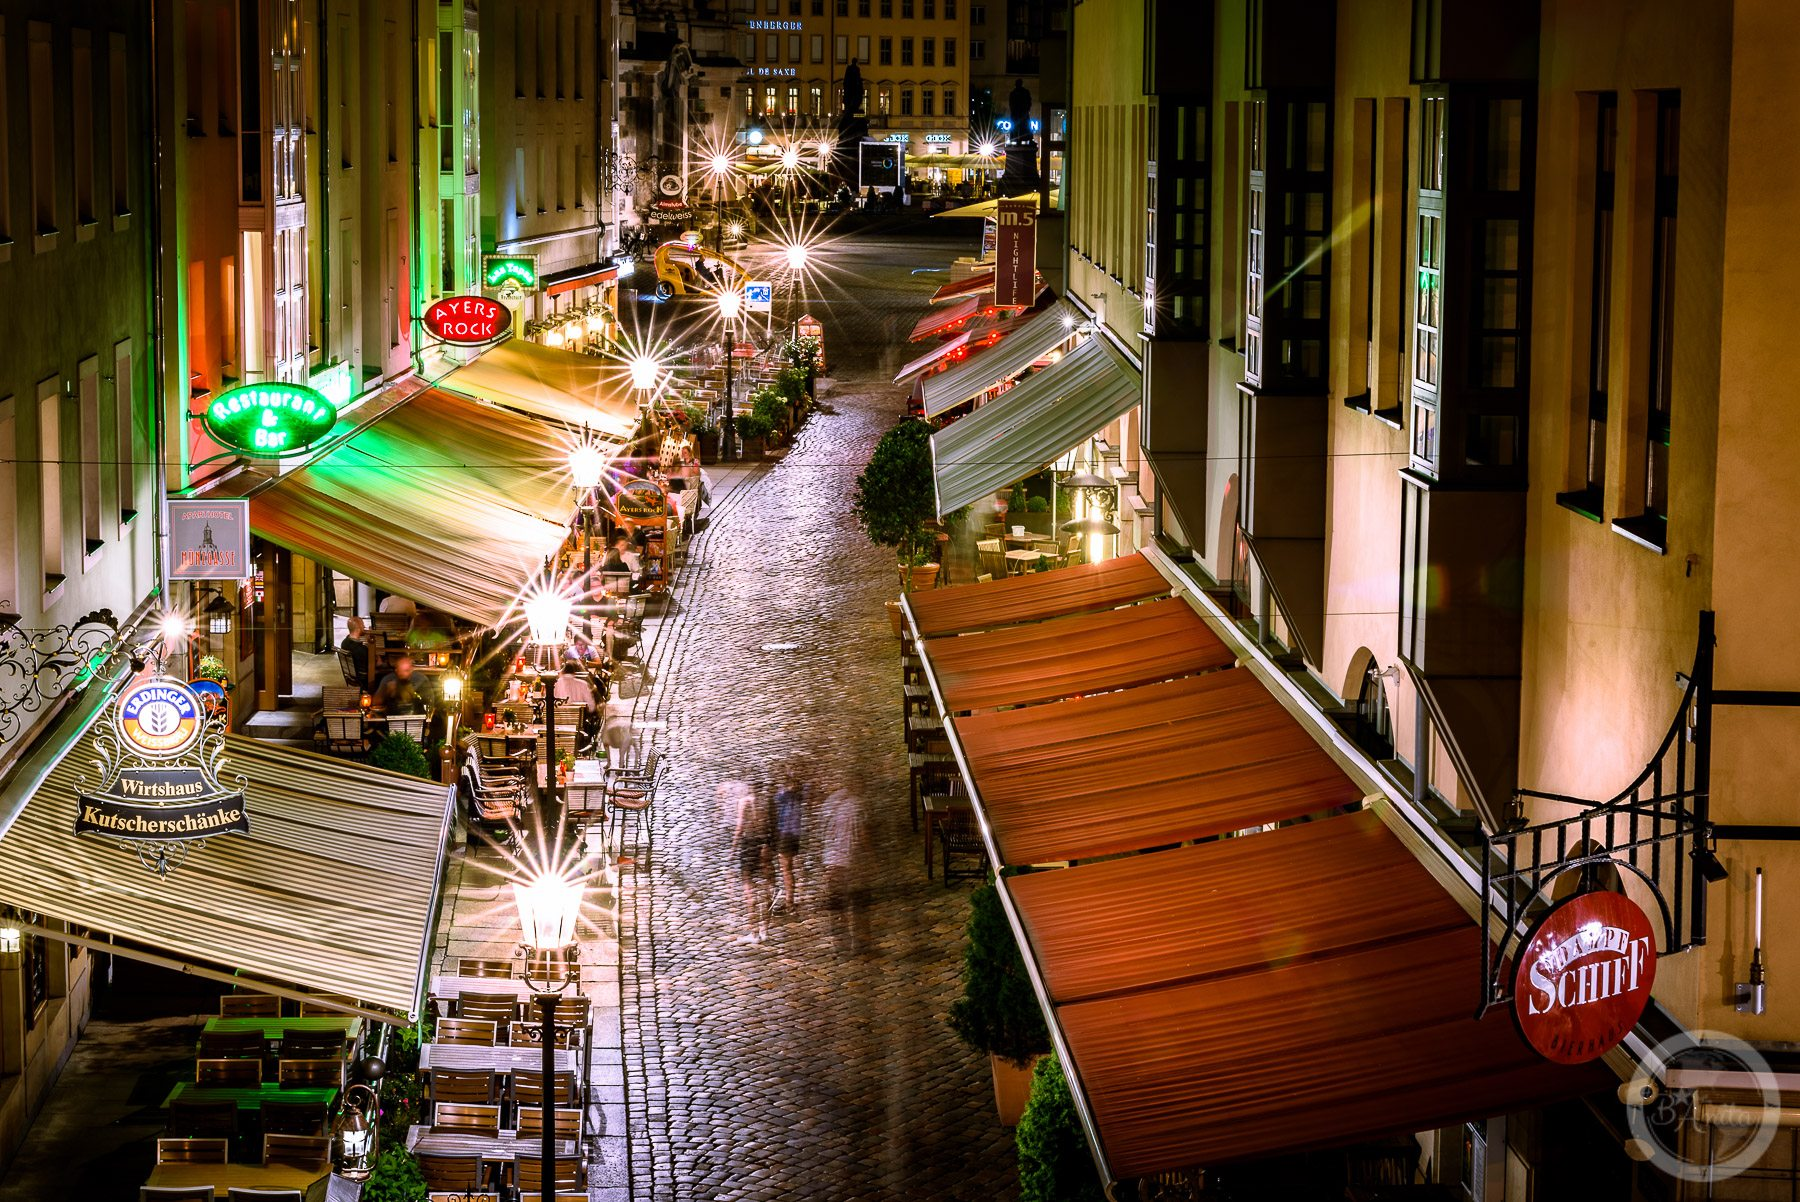 Gwarna uliczka Münzgasse